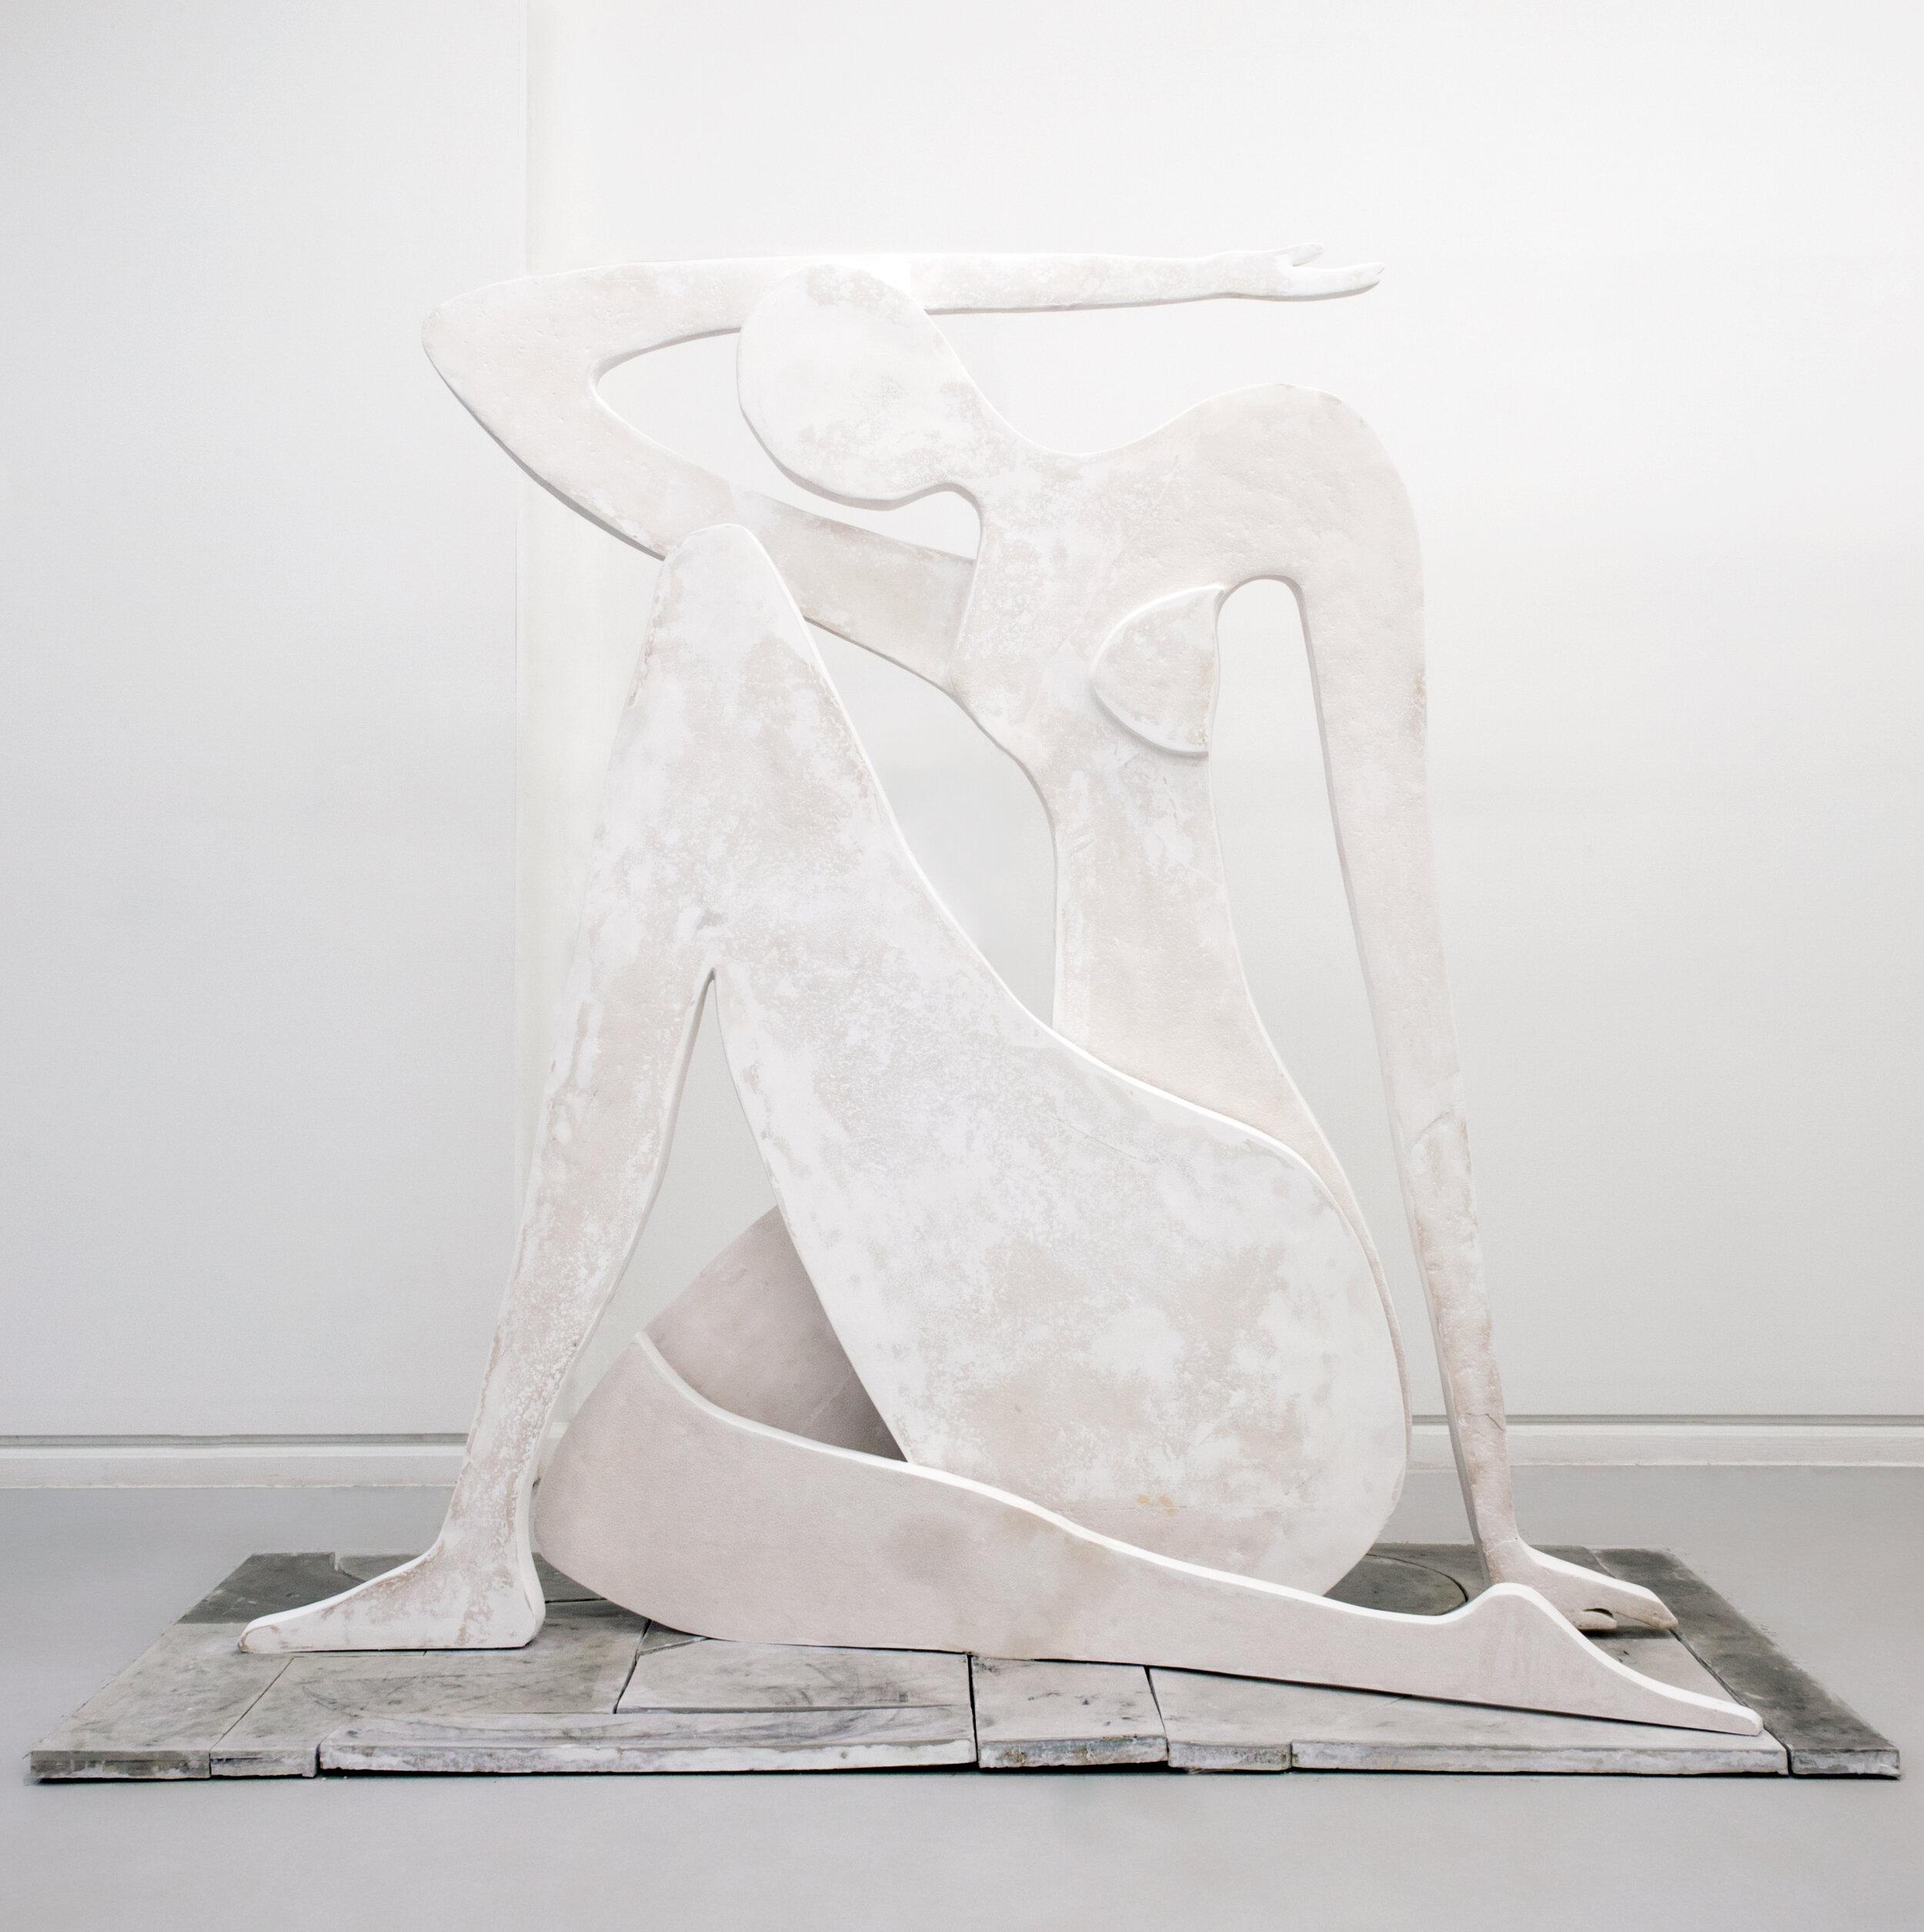 Artist Carolyn Salas Mrs Gallery